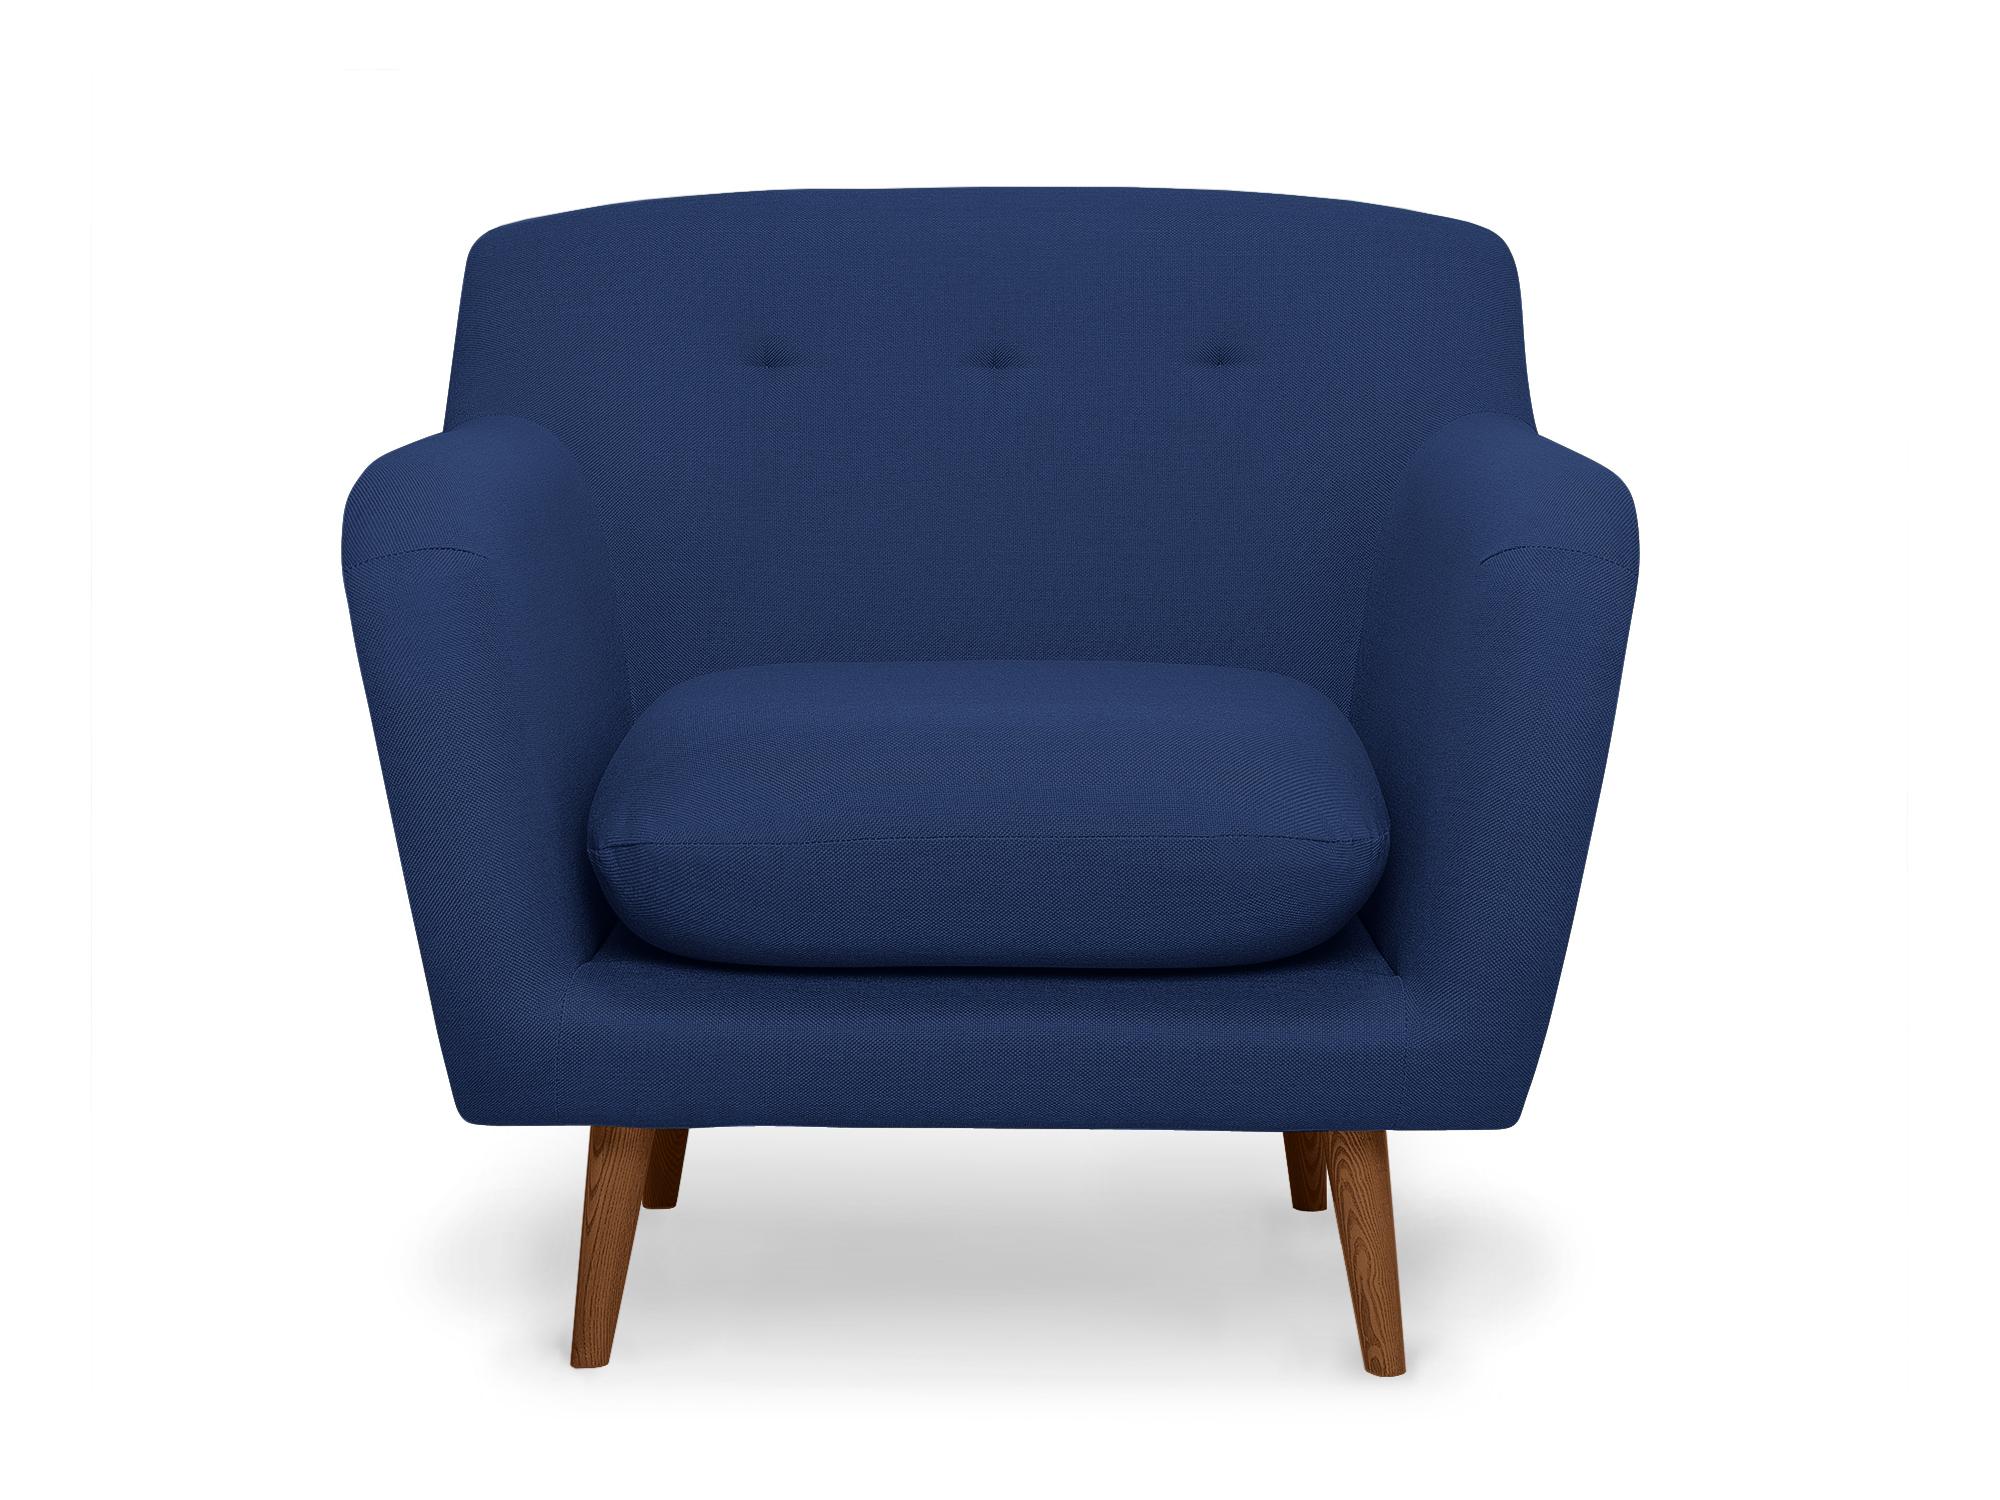 Кресло MyFurnish 15435635 от thefurnish